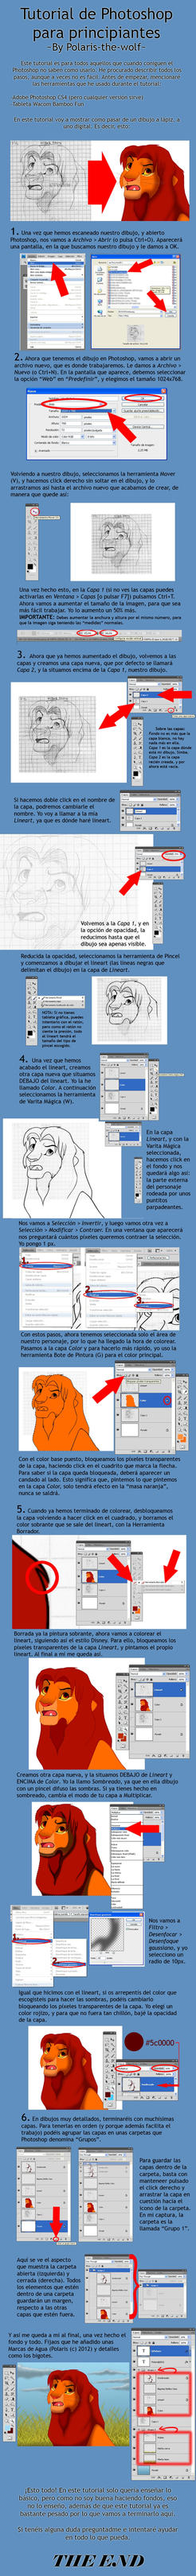 Tutorial Basico para Photoshop by RakPolaris